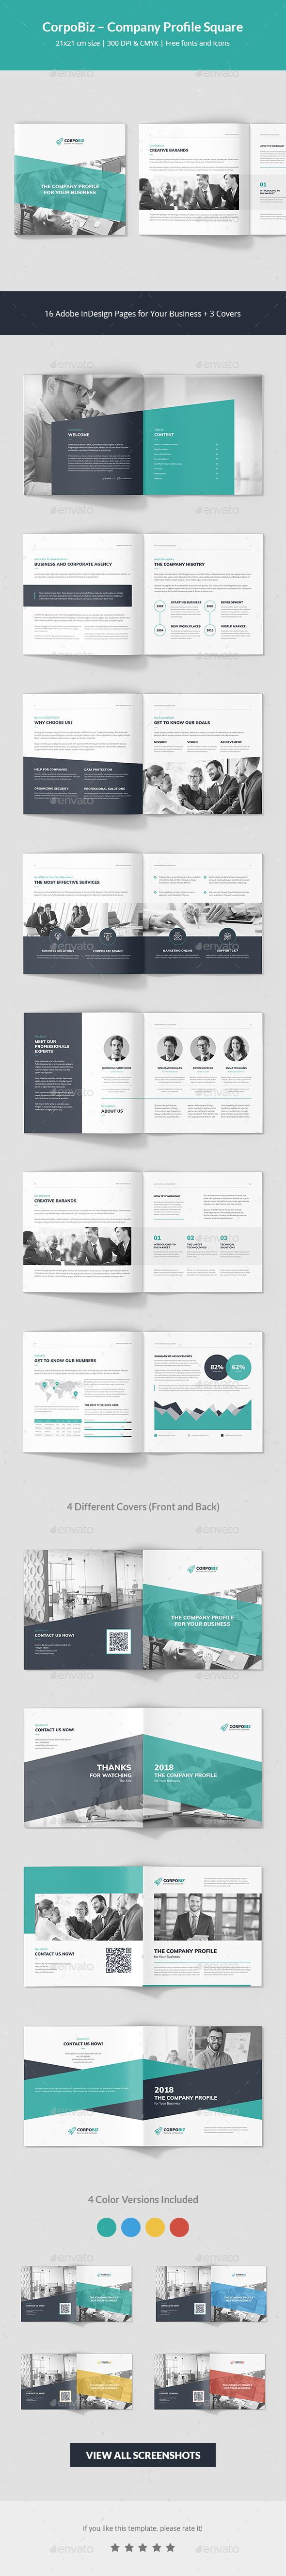 CorpoBiz – Business and Corporate Company Profile Square - Corporate Brochures